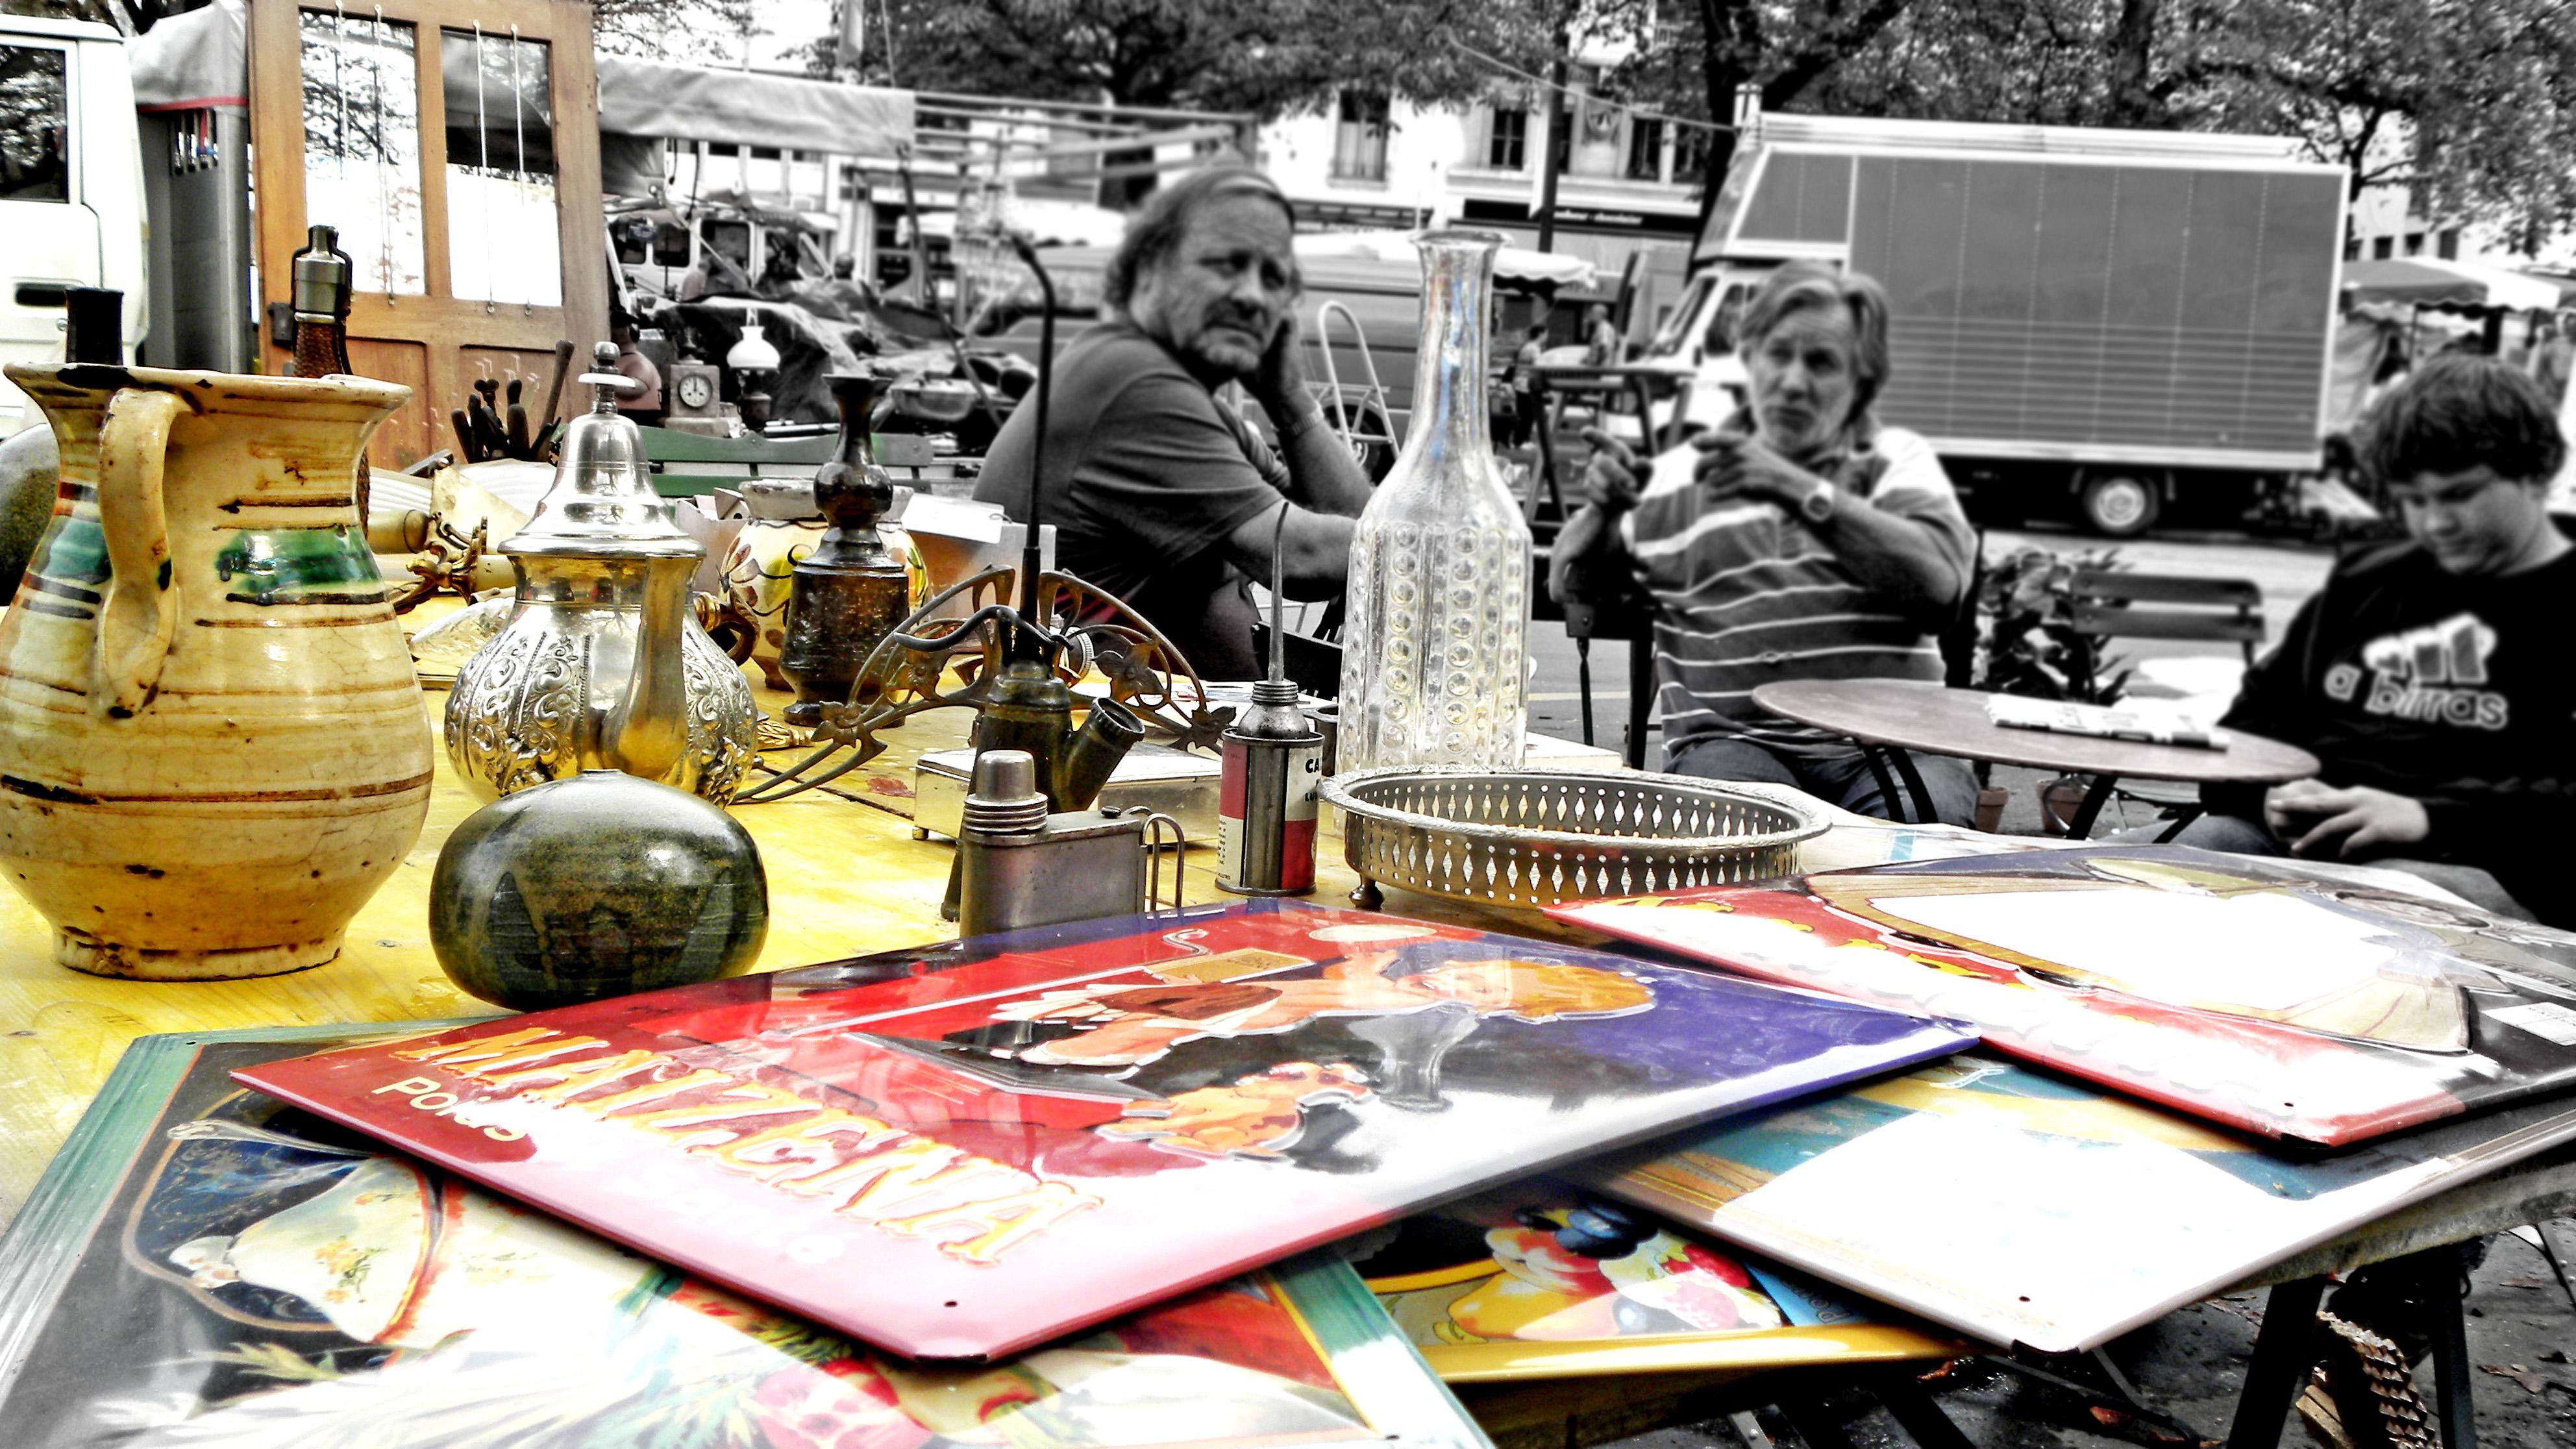 Plainpalais fleamarket,Top things to do in Geneva